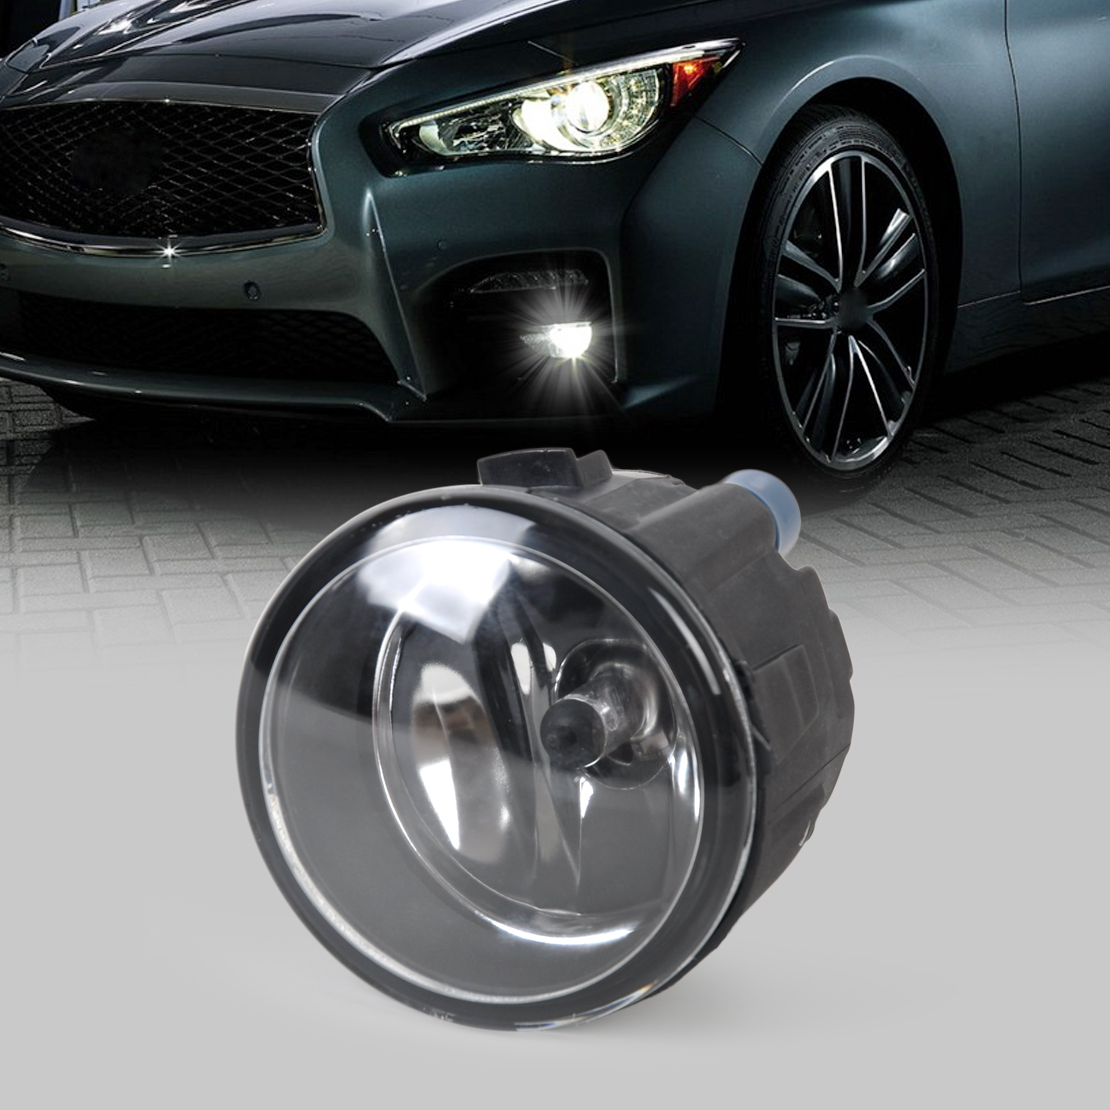 beler Right / Left Fog Light Lamp with H11 Halogen 55W Bulb Assembly 261508993B, 261508992B for Nissan Juke Rogue Infiniti EX35